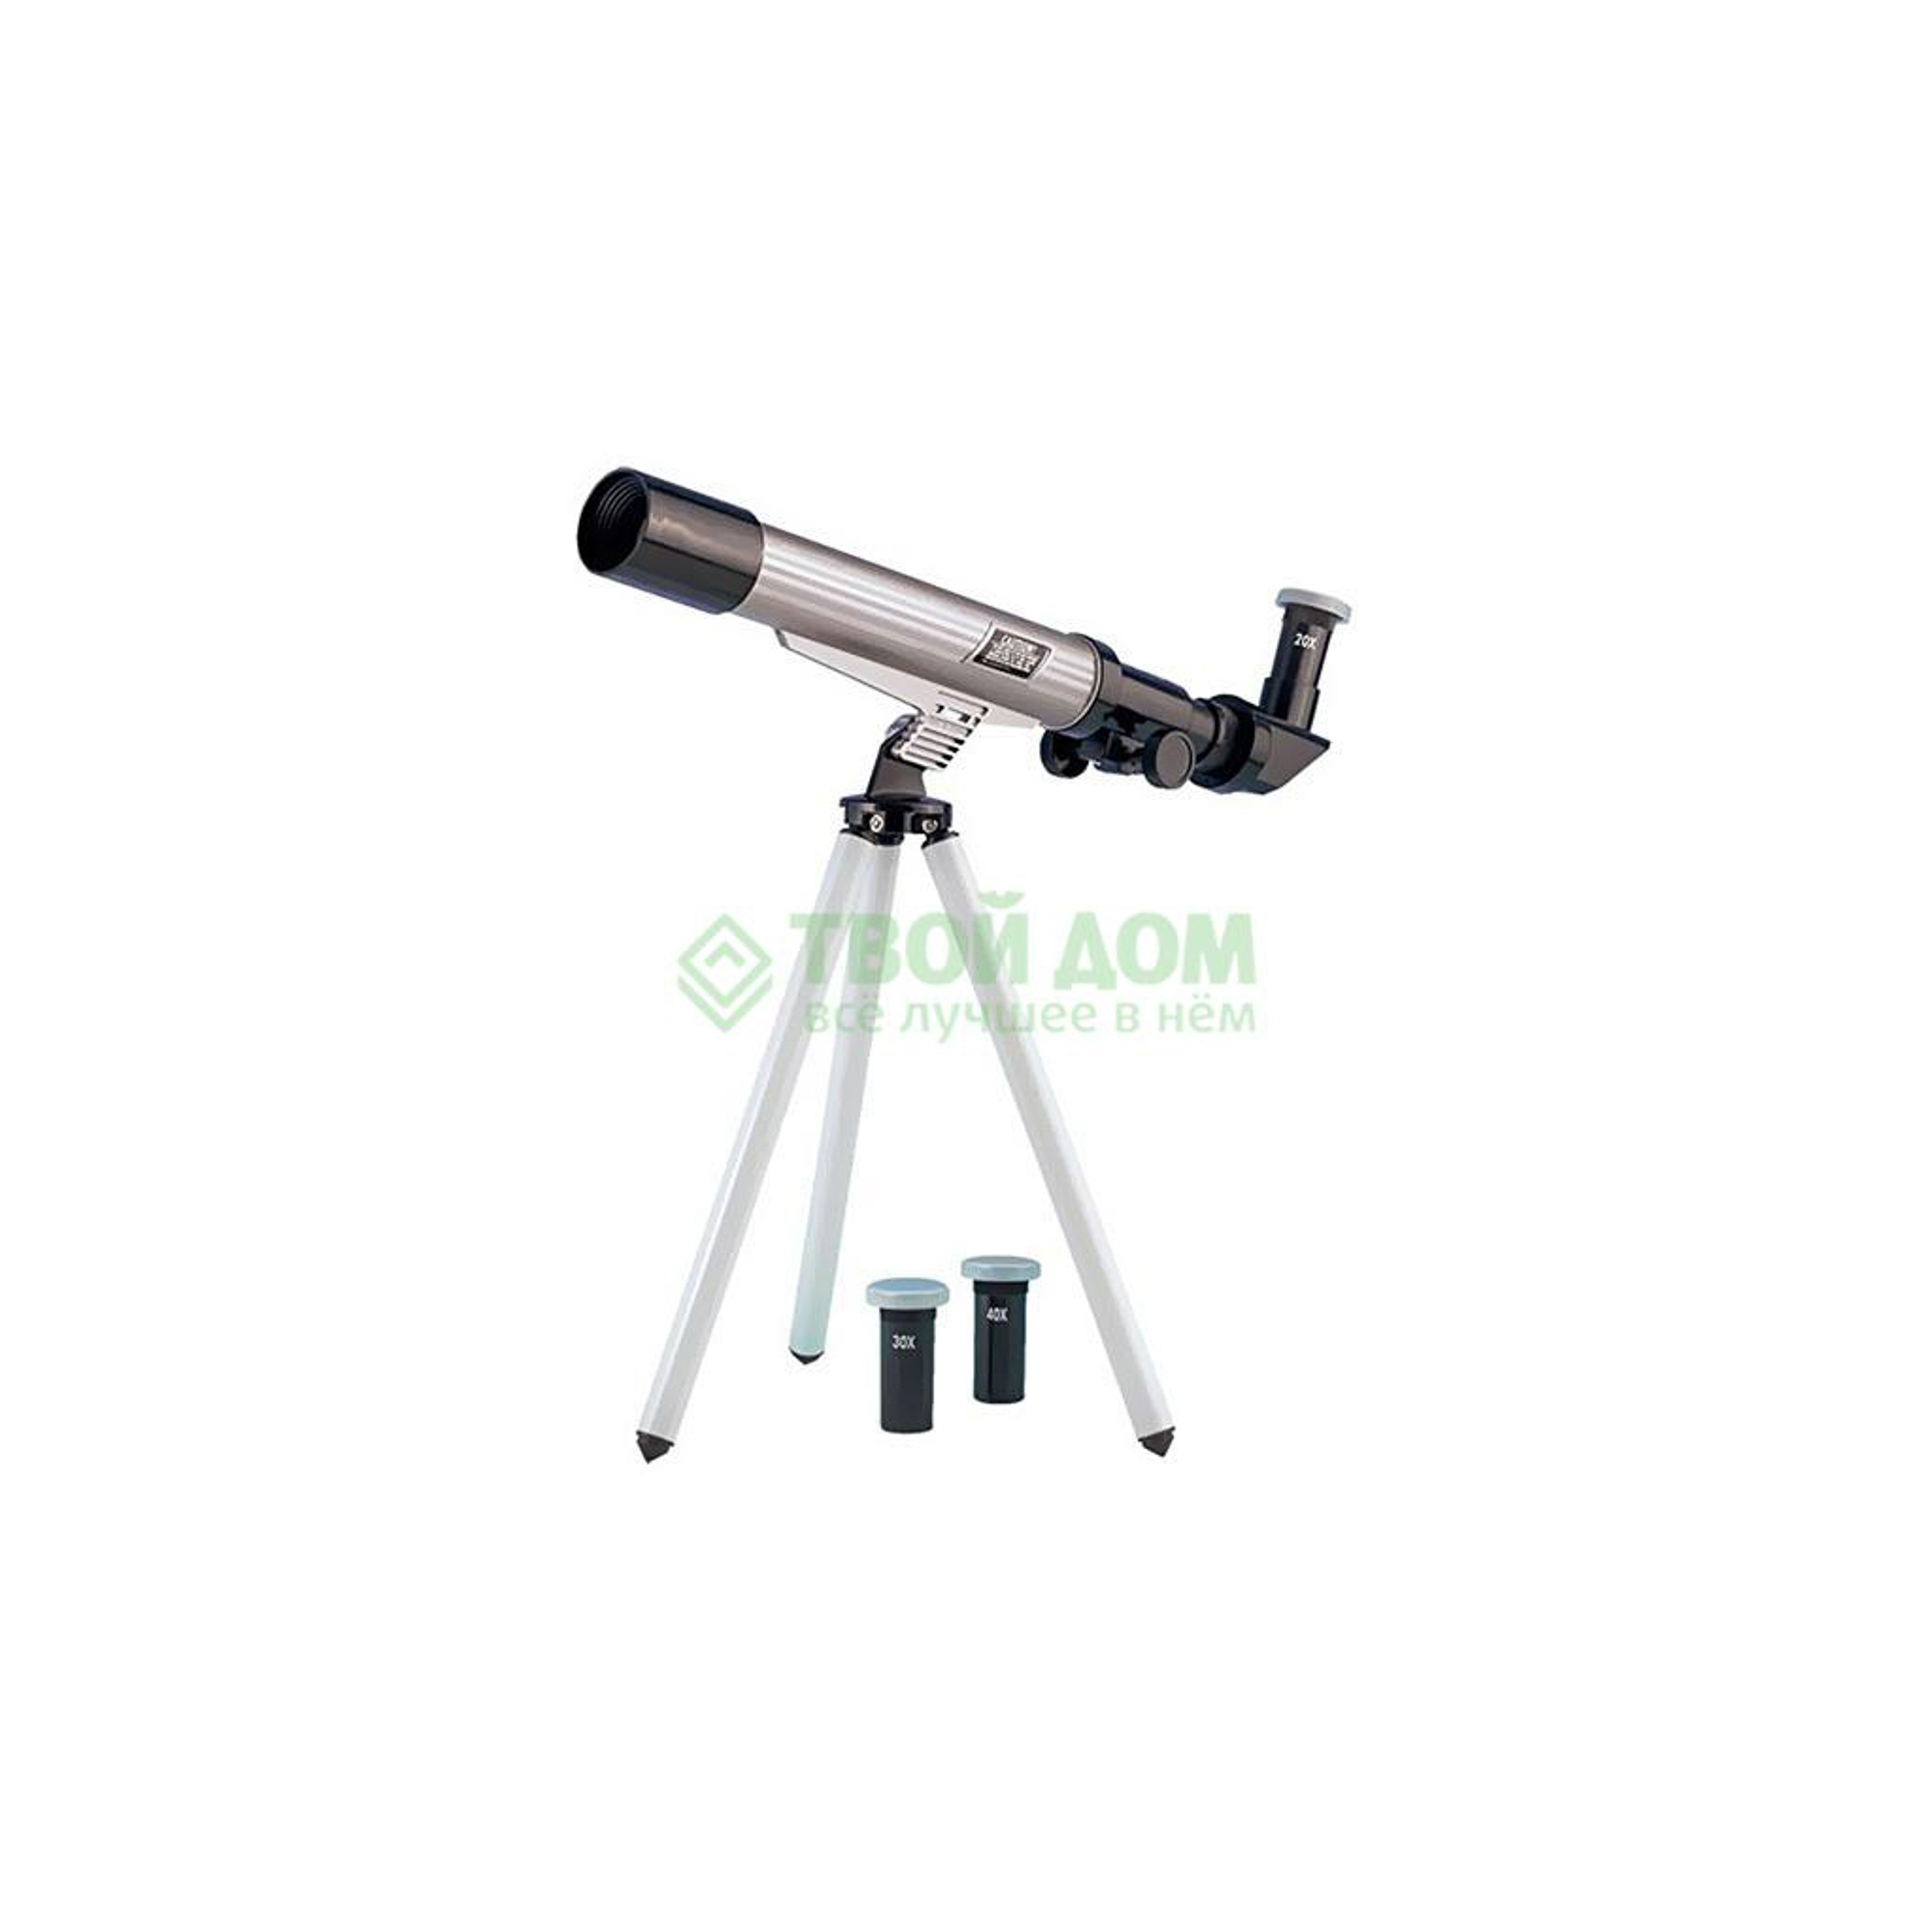 Игровой набор Edu toys Телескоп 20х30х40 edu-toys (TS023).